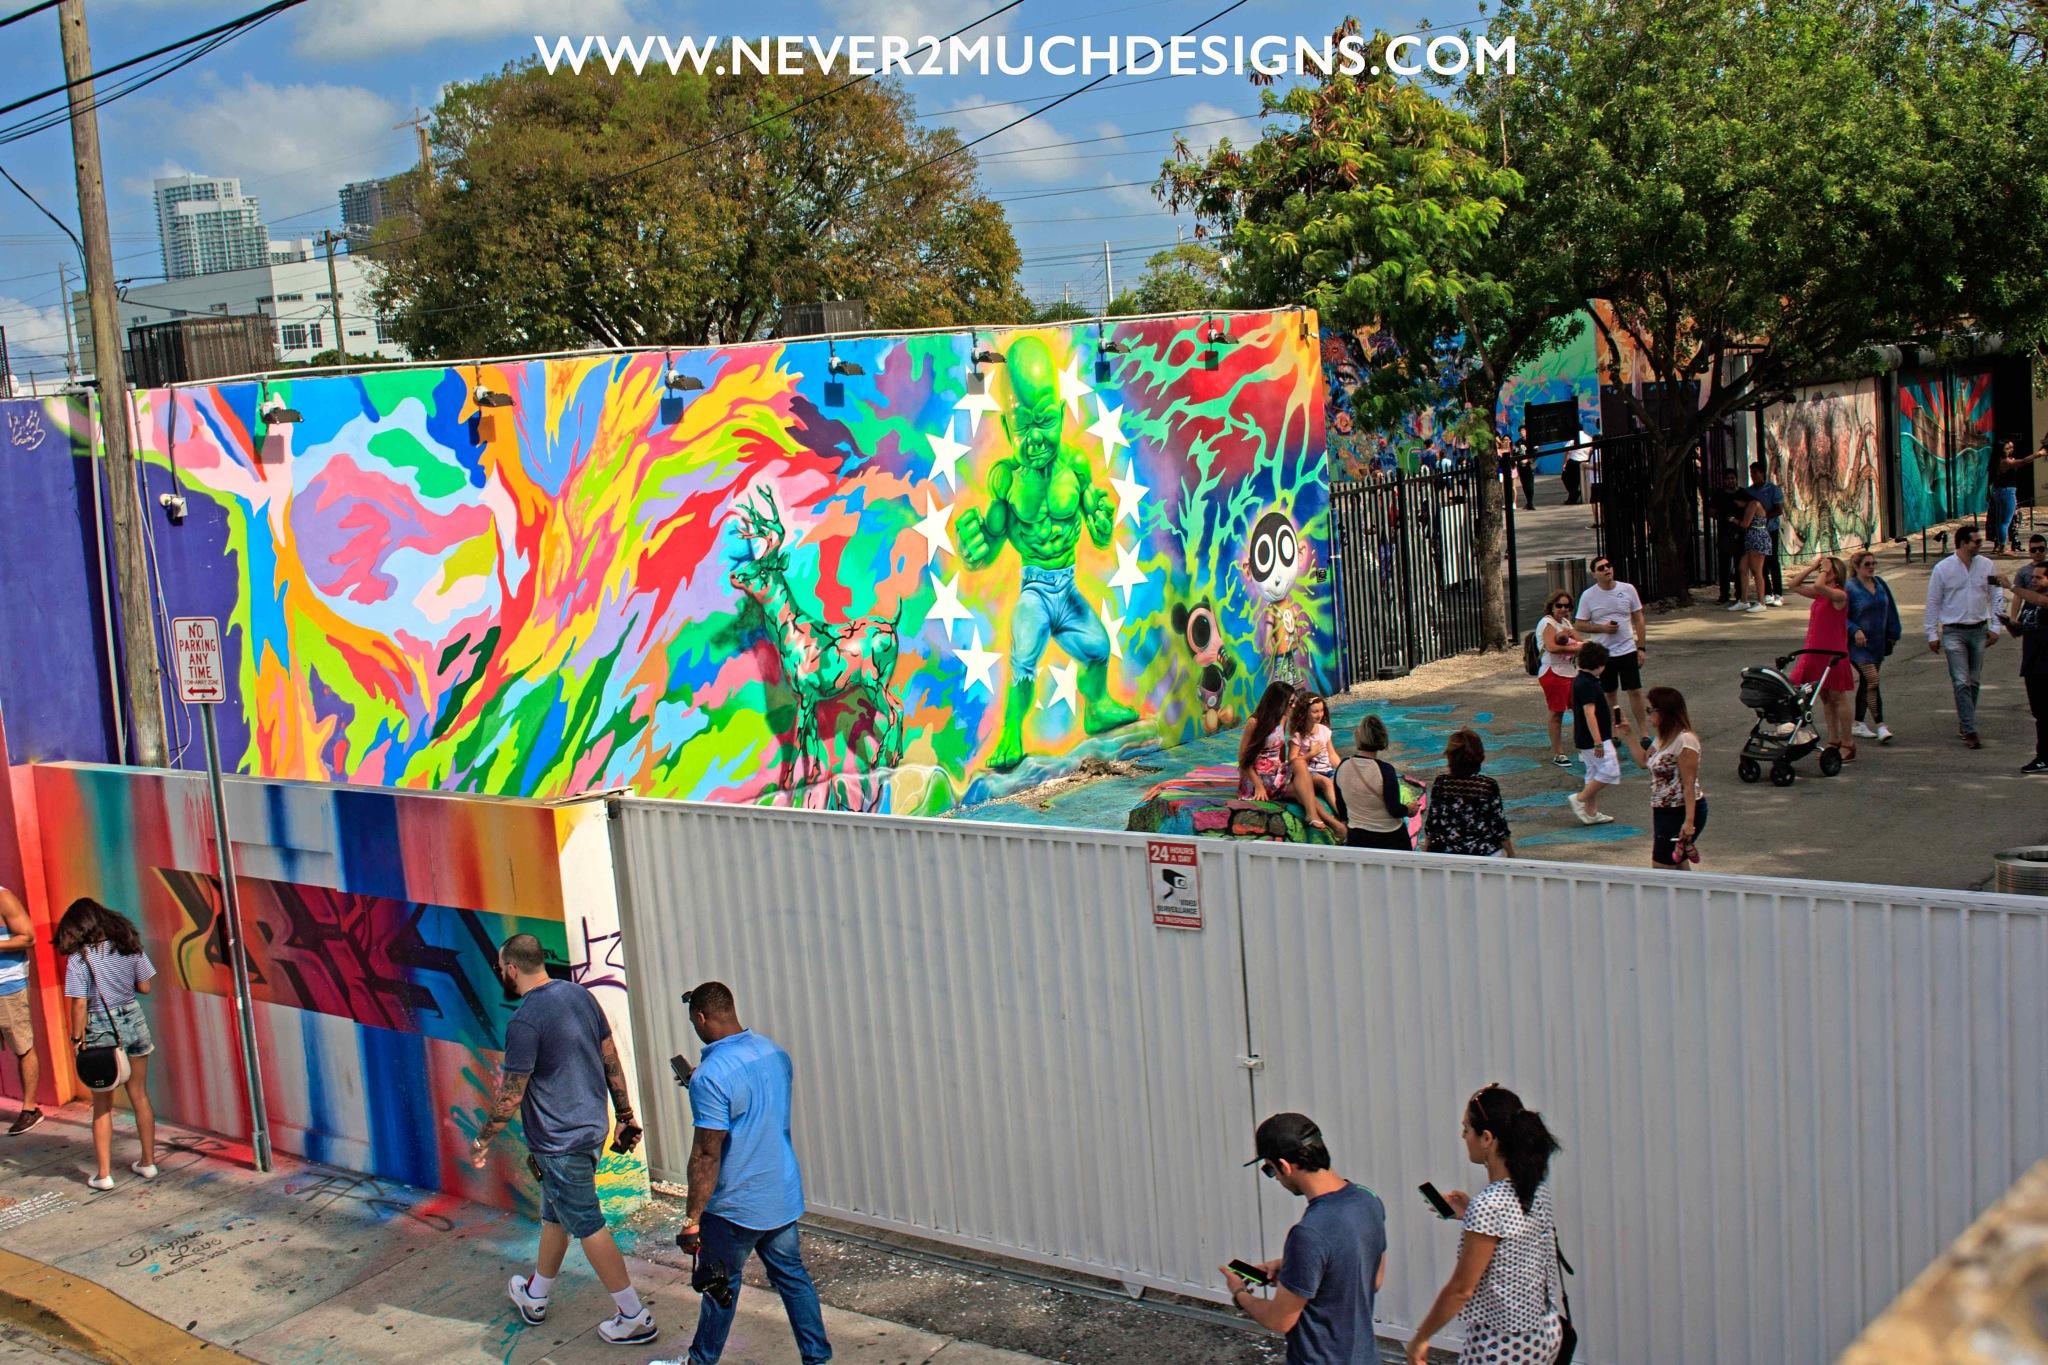 Bright Walls by Michael Vascellaro